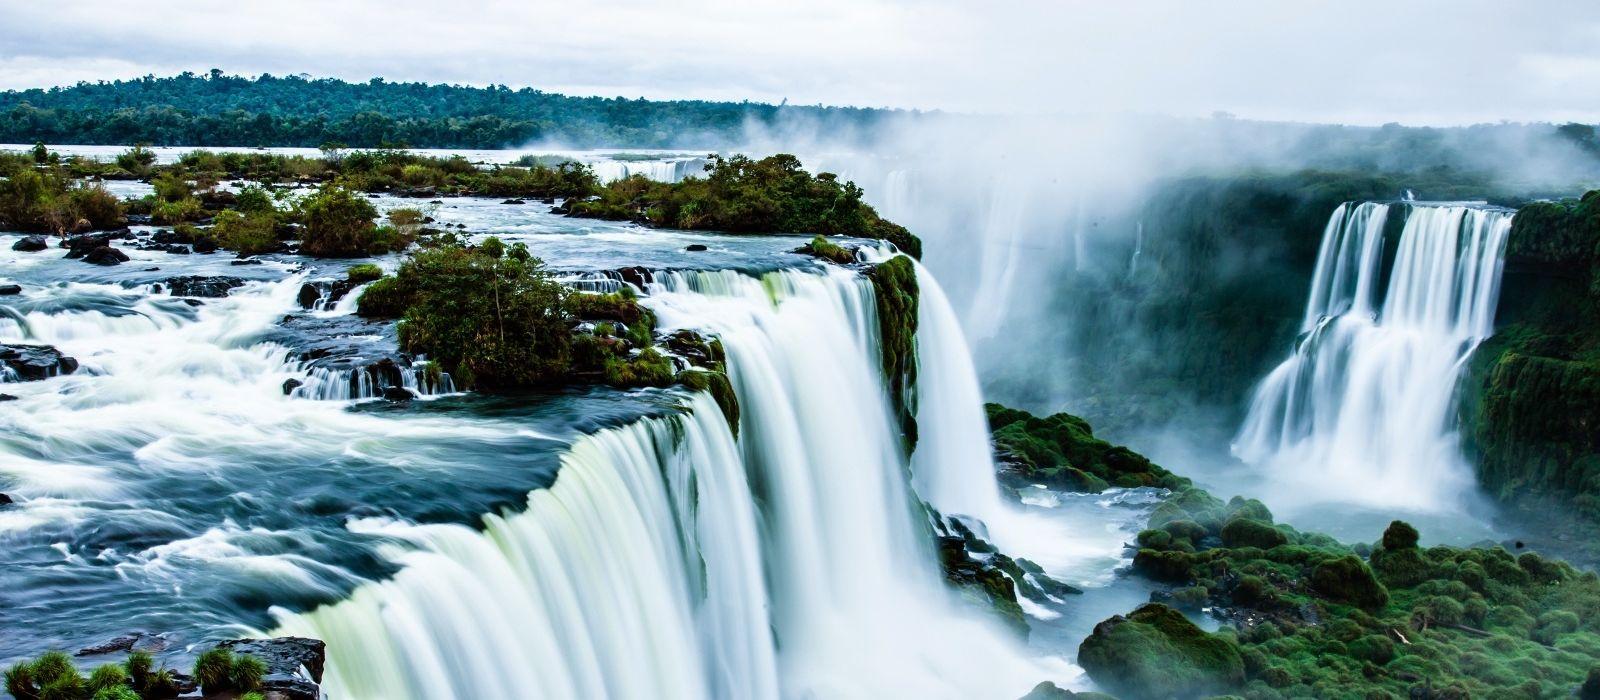 Fall Wallpaper Themes Iguaz 250 Falls The World S Largest Waterfalls Enchanting